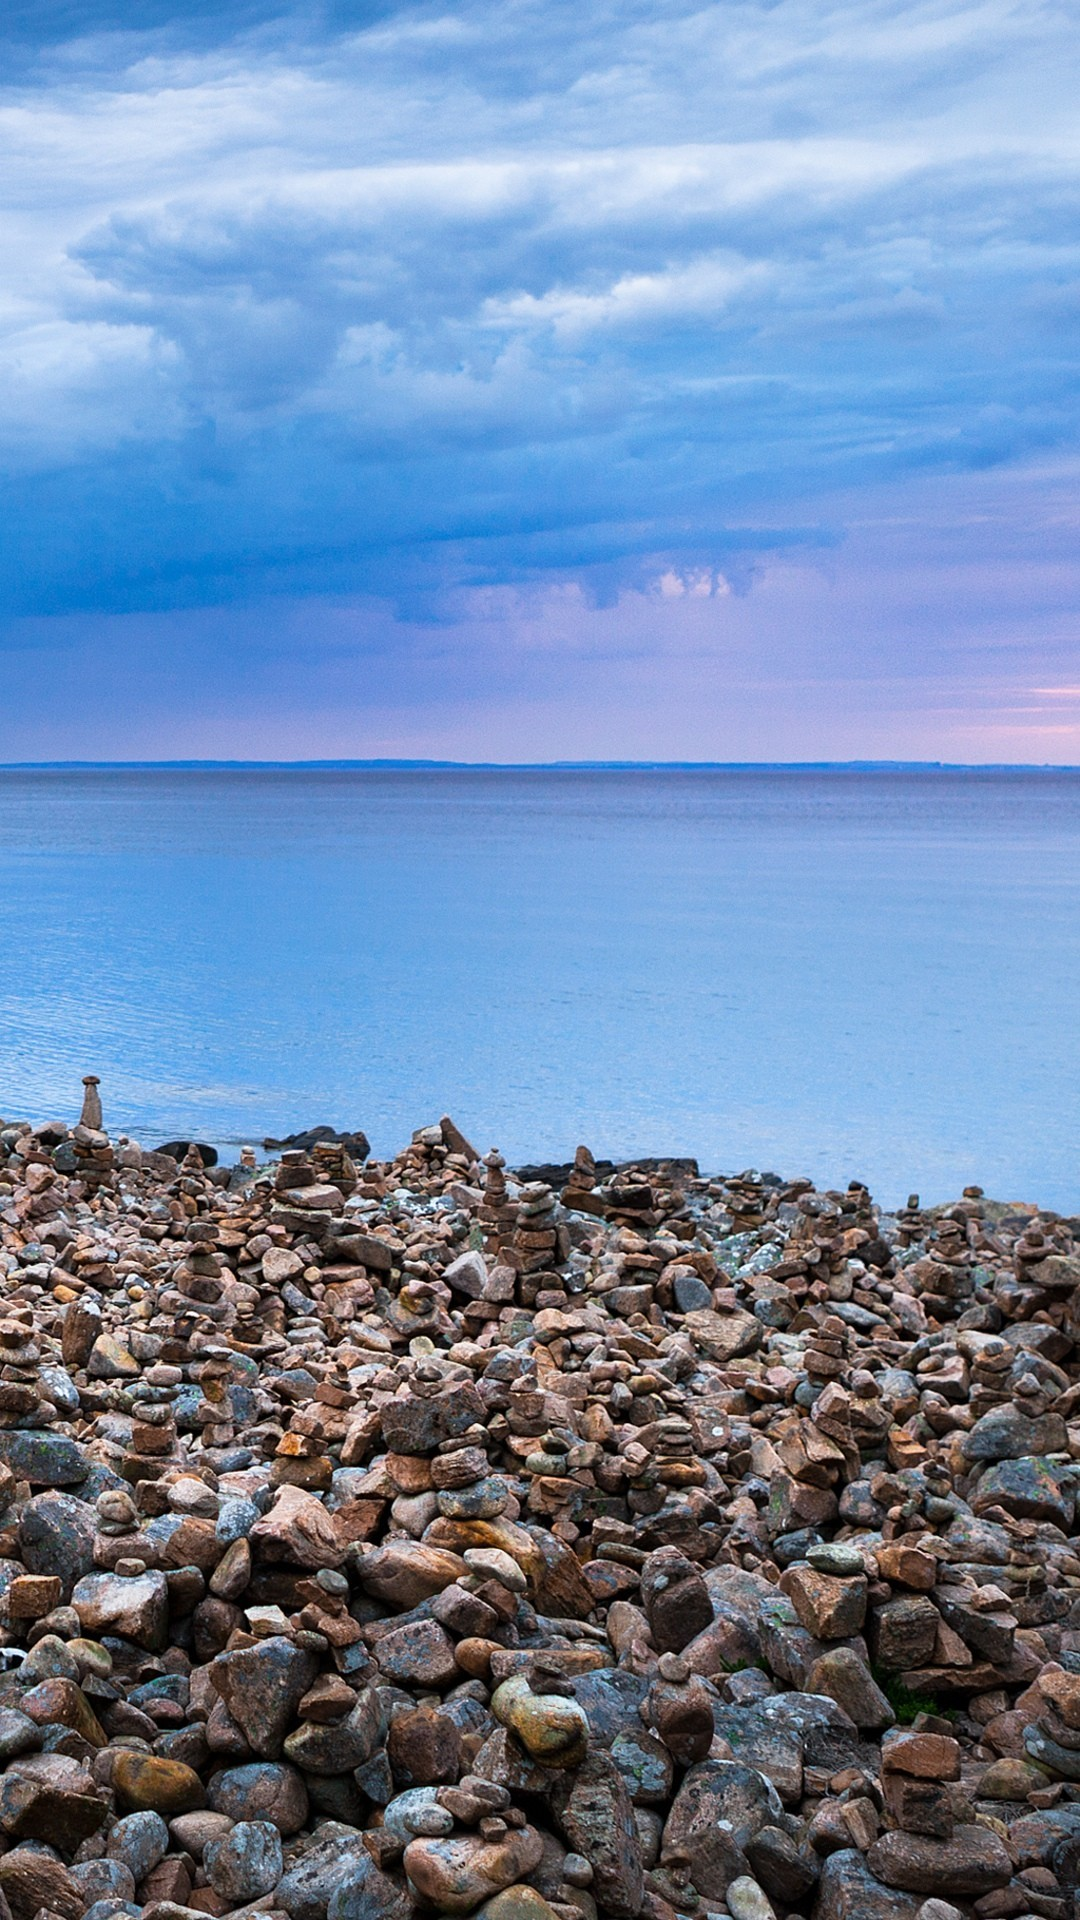 Nature iPhone 6 Plus Wallpapers – Beach Rocks Beautiful Sea iPhone 6 Plus  HD Wallpaper #